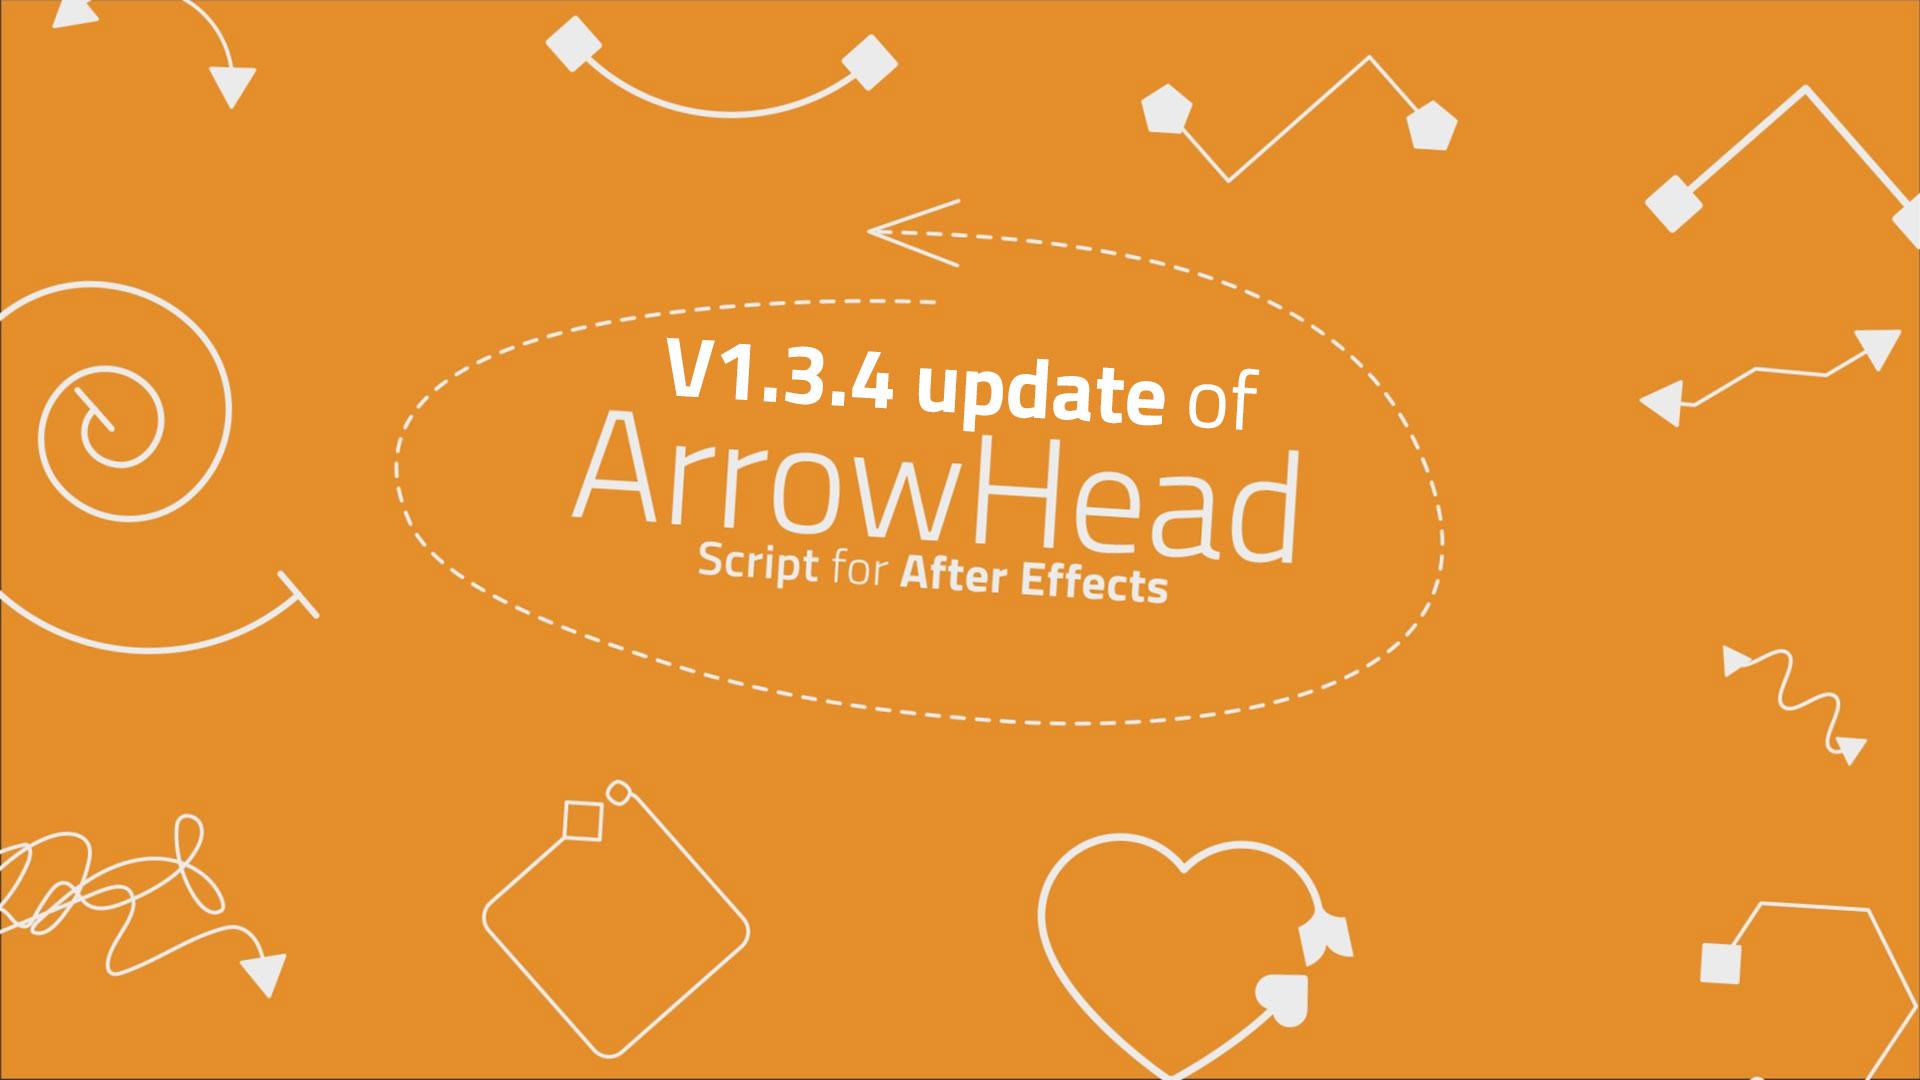 ArrowHead v1.3.4 update